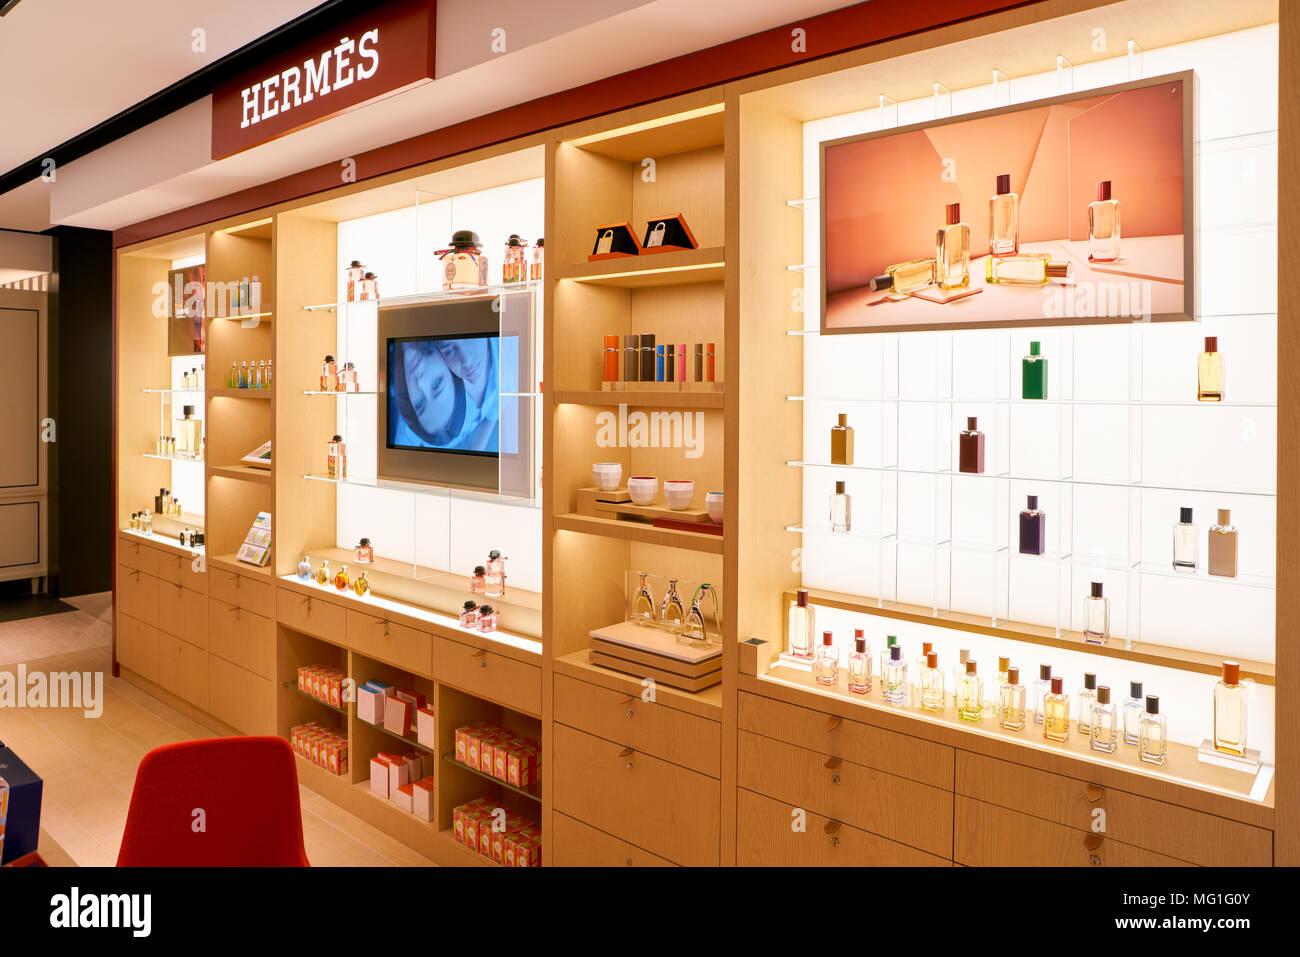 RomeItalie Hermes Circa 2017NovembreBouteilles S De Parfum WeH2YE9ID